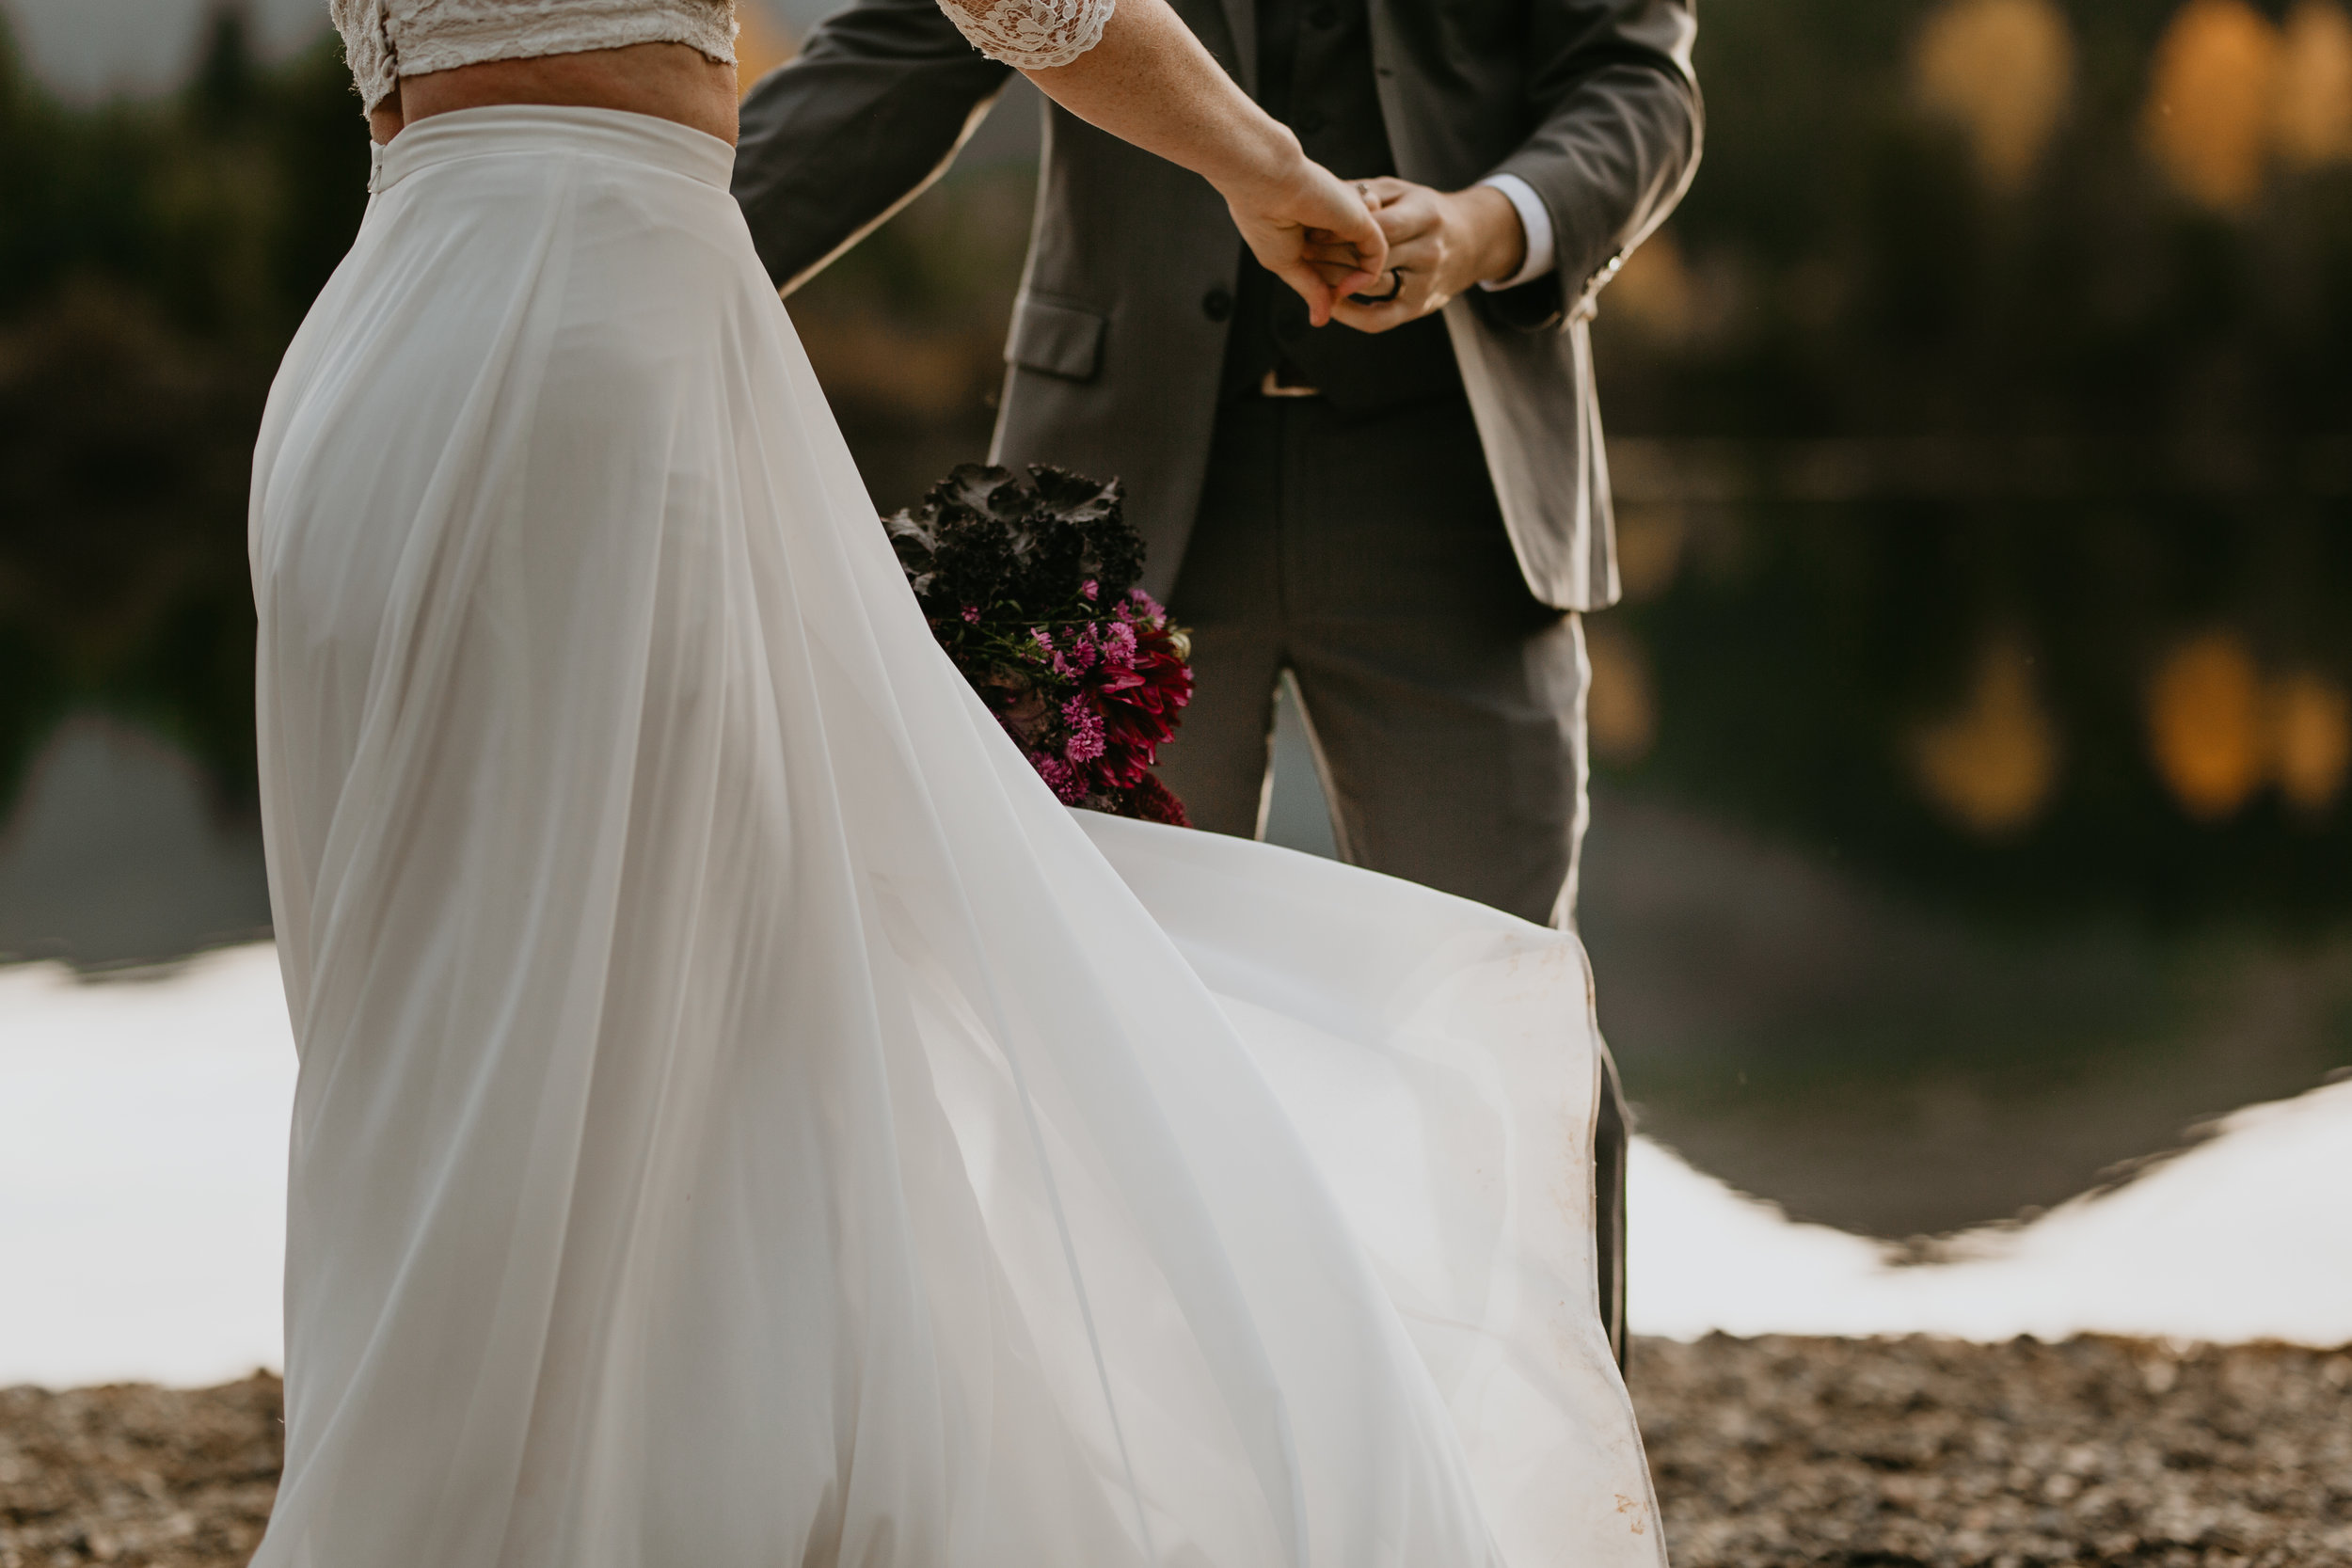 nicole-daacke-photography-mountain-view-elopement-at-gold-creek-pond-snoqualmie-washington-wa-elopement-photographer-photography-adventure-elopement-in-washington-fall-lakeside-golden-sunset-boho-fun-bride-2777.jpg